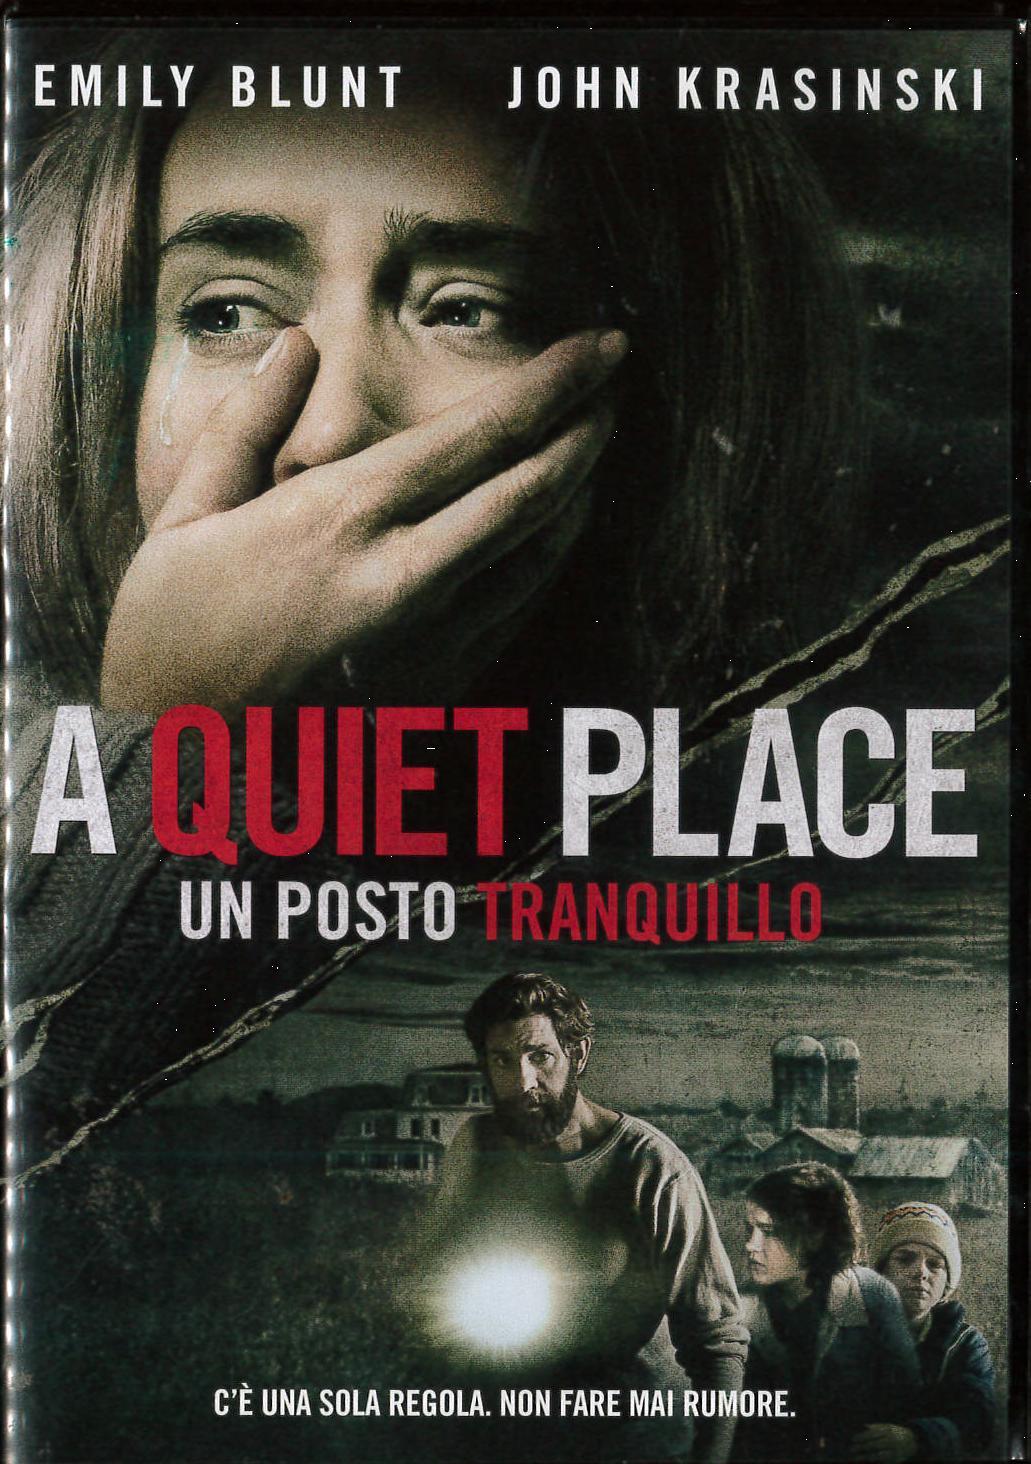 A QUIET PLACE - UN POSTO TRANQUILLO (DVD)